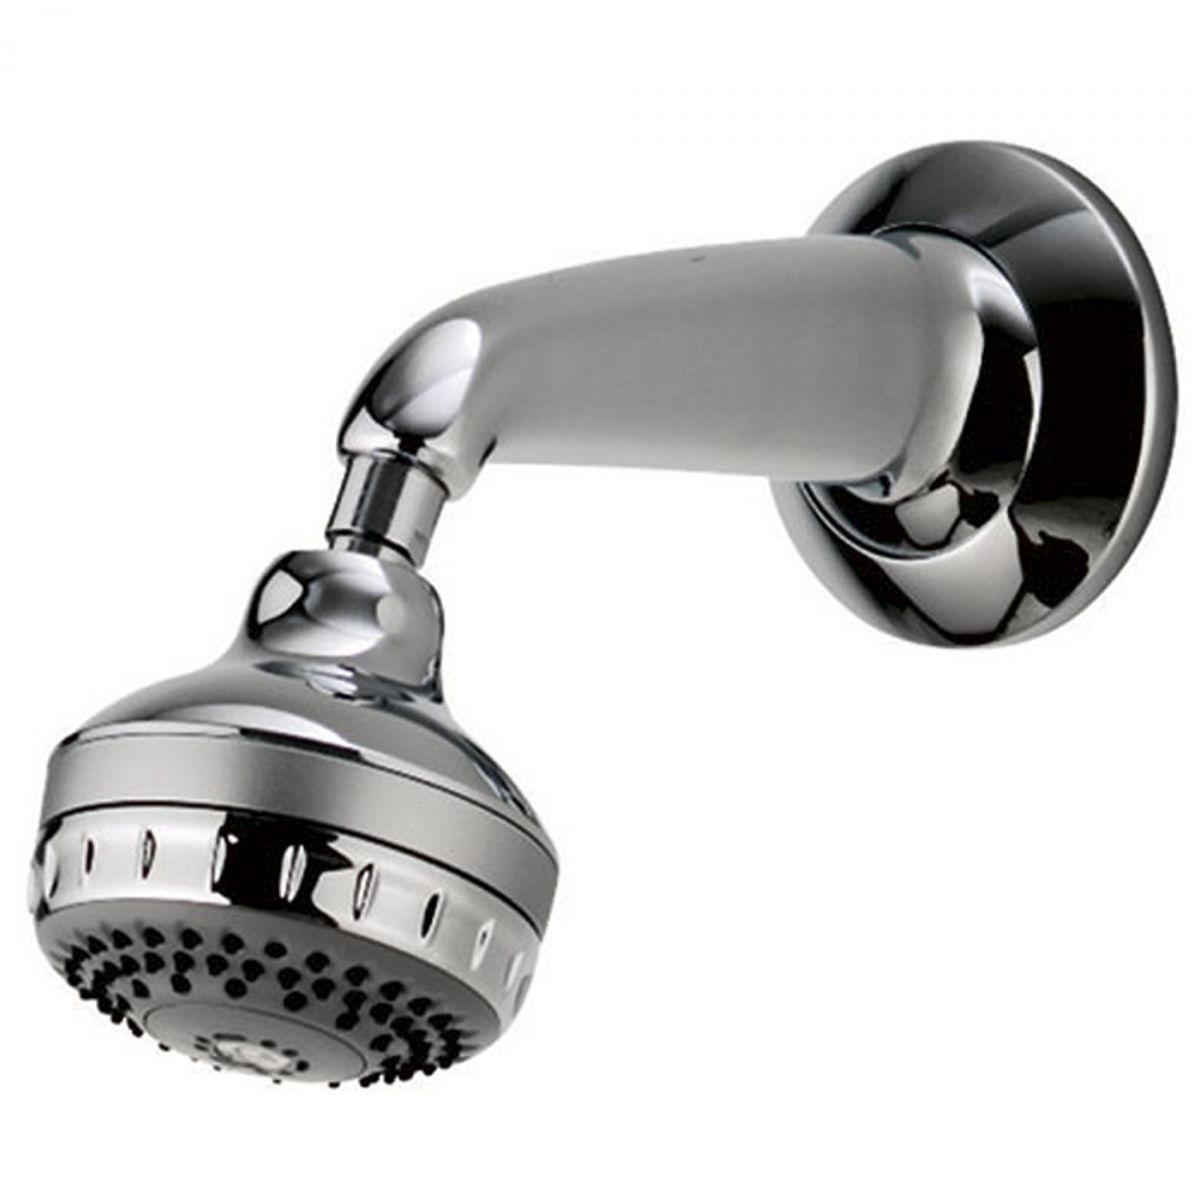 Aqualisa Turbostream Fixed Shower Head : UK Bathrooms